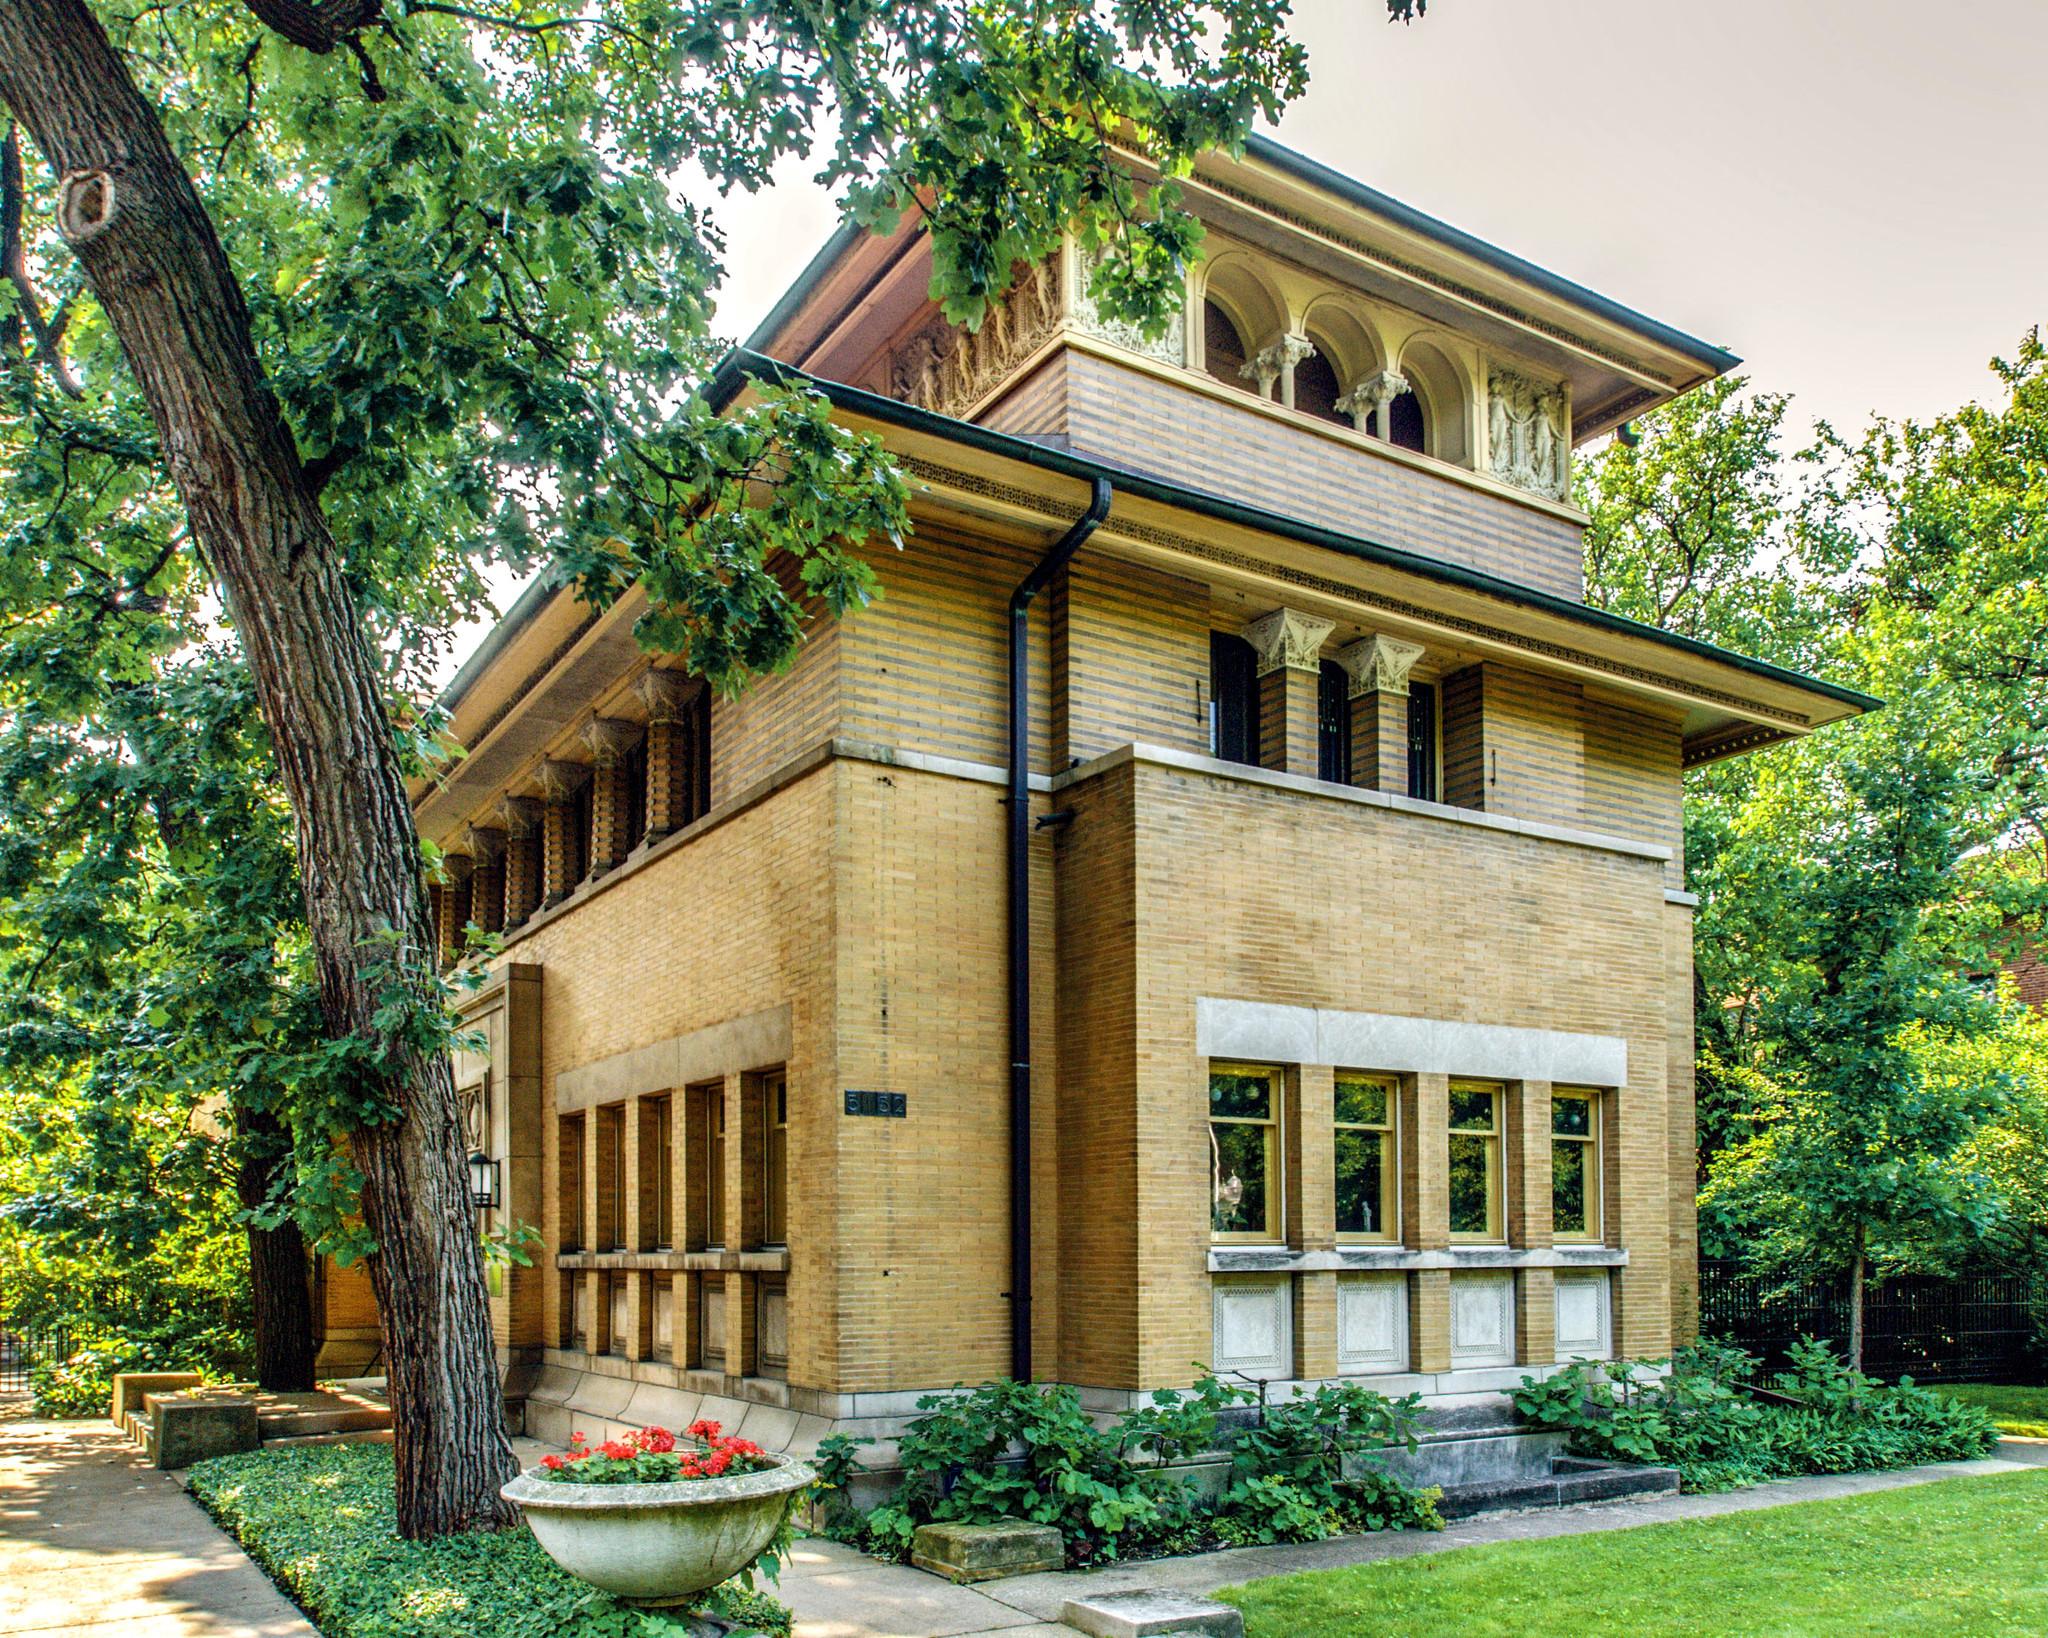 Frank lloyd wright designed home in hyde park for Franks homes